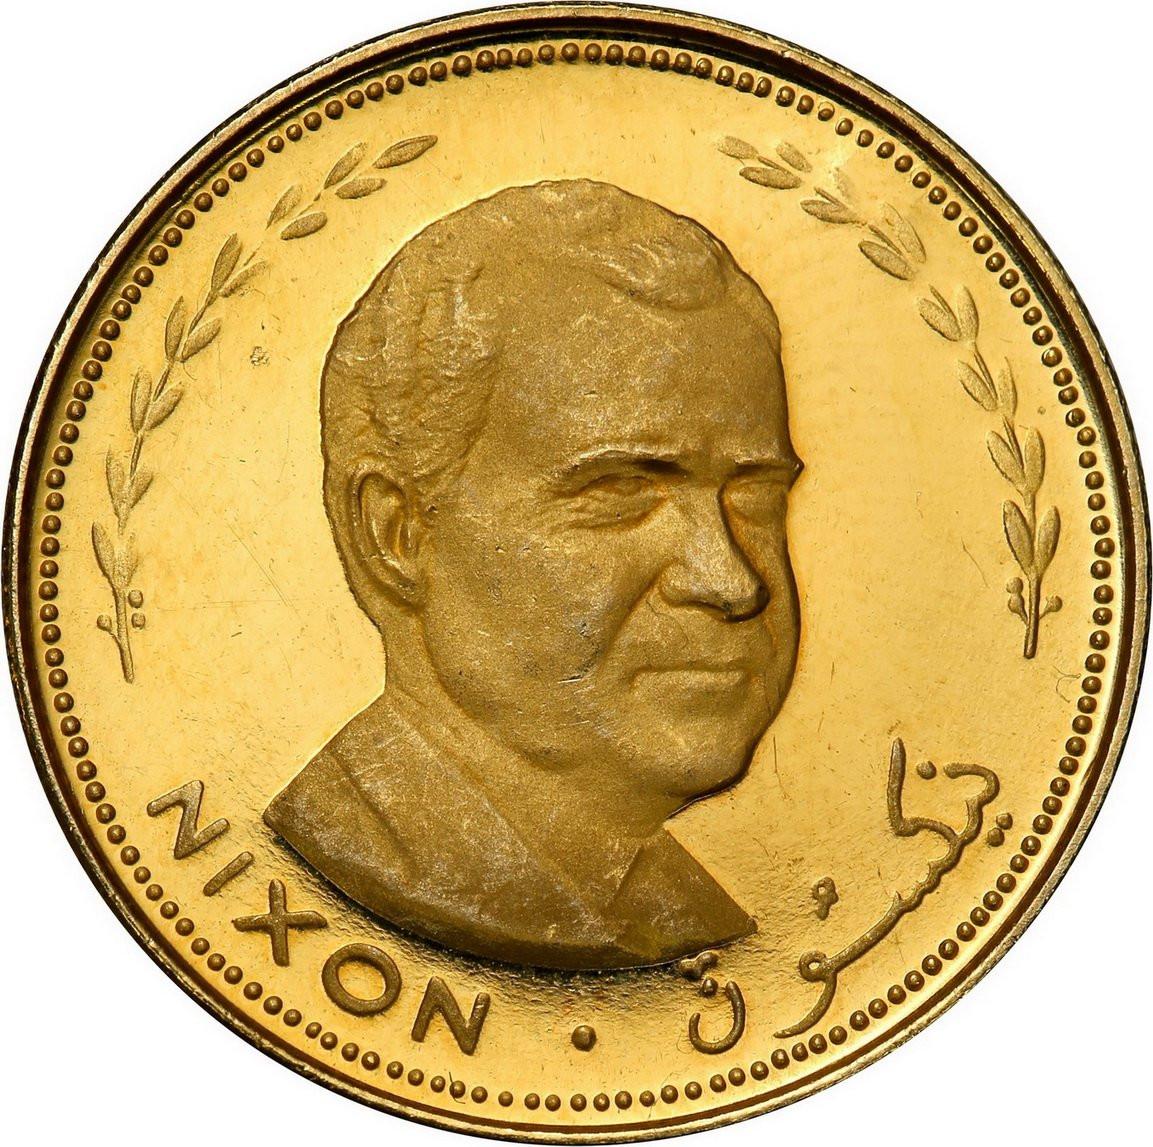 Fujairah Zjednoczone Emiraty Arabskie. 25 Riyals AH 1388 (1969) Nixon